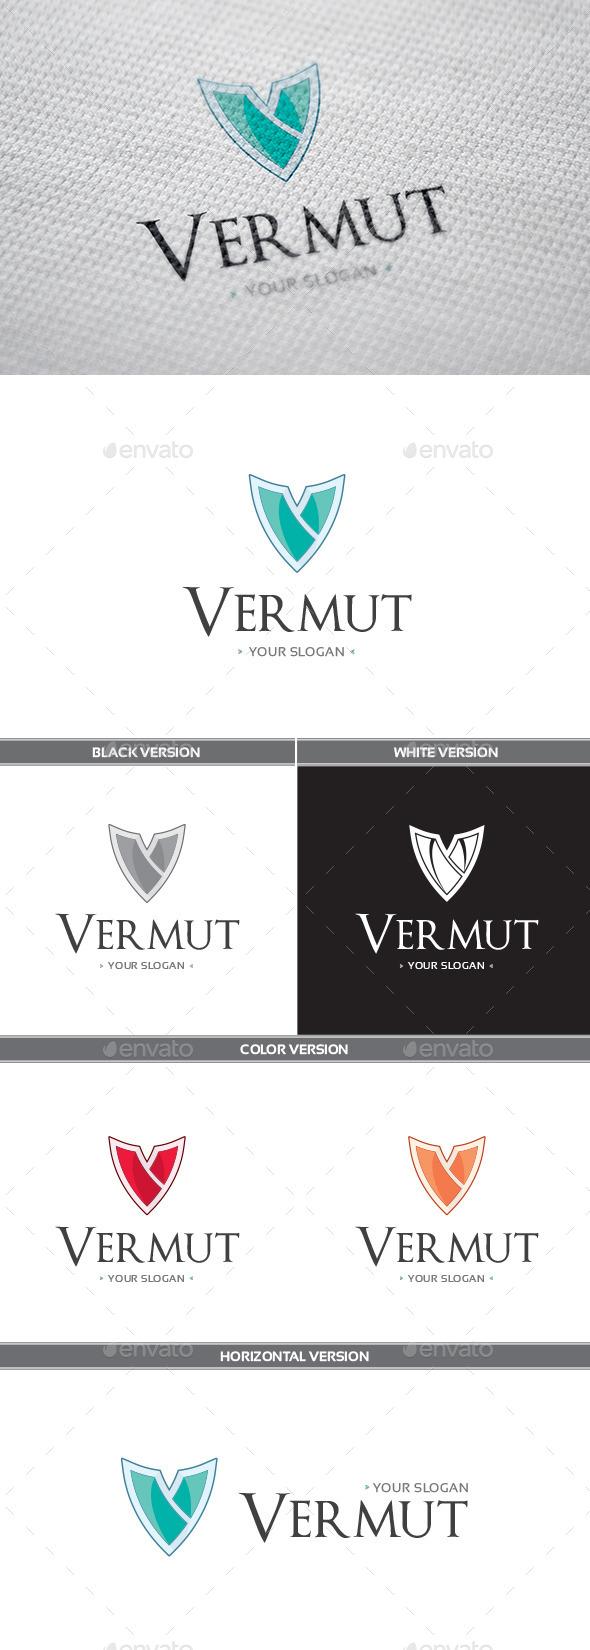 GraphicRiver Vermut Logo 9150937